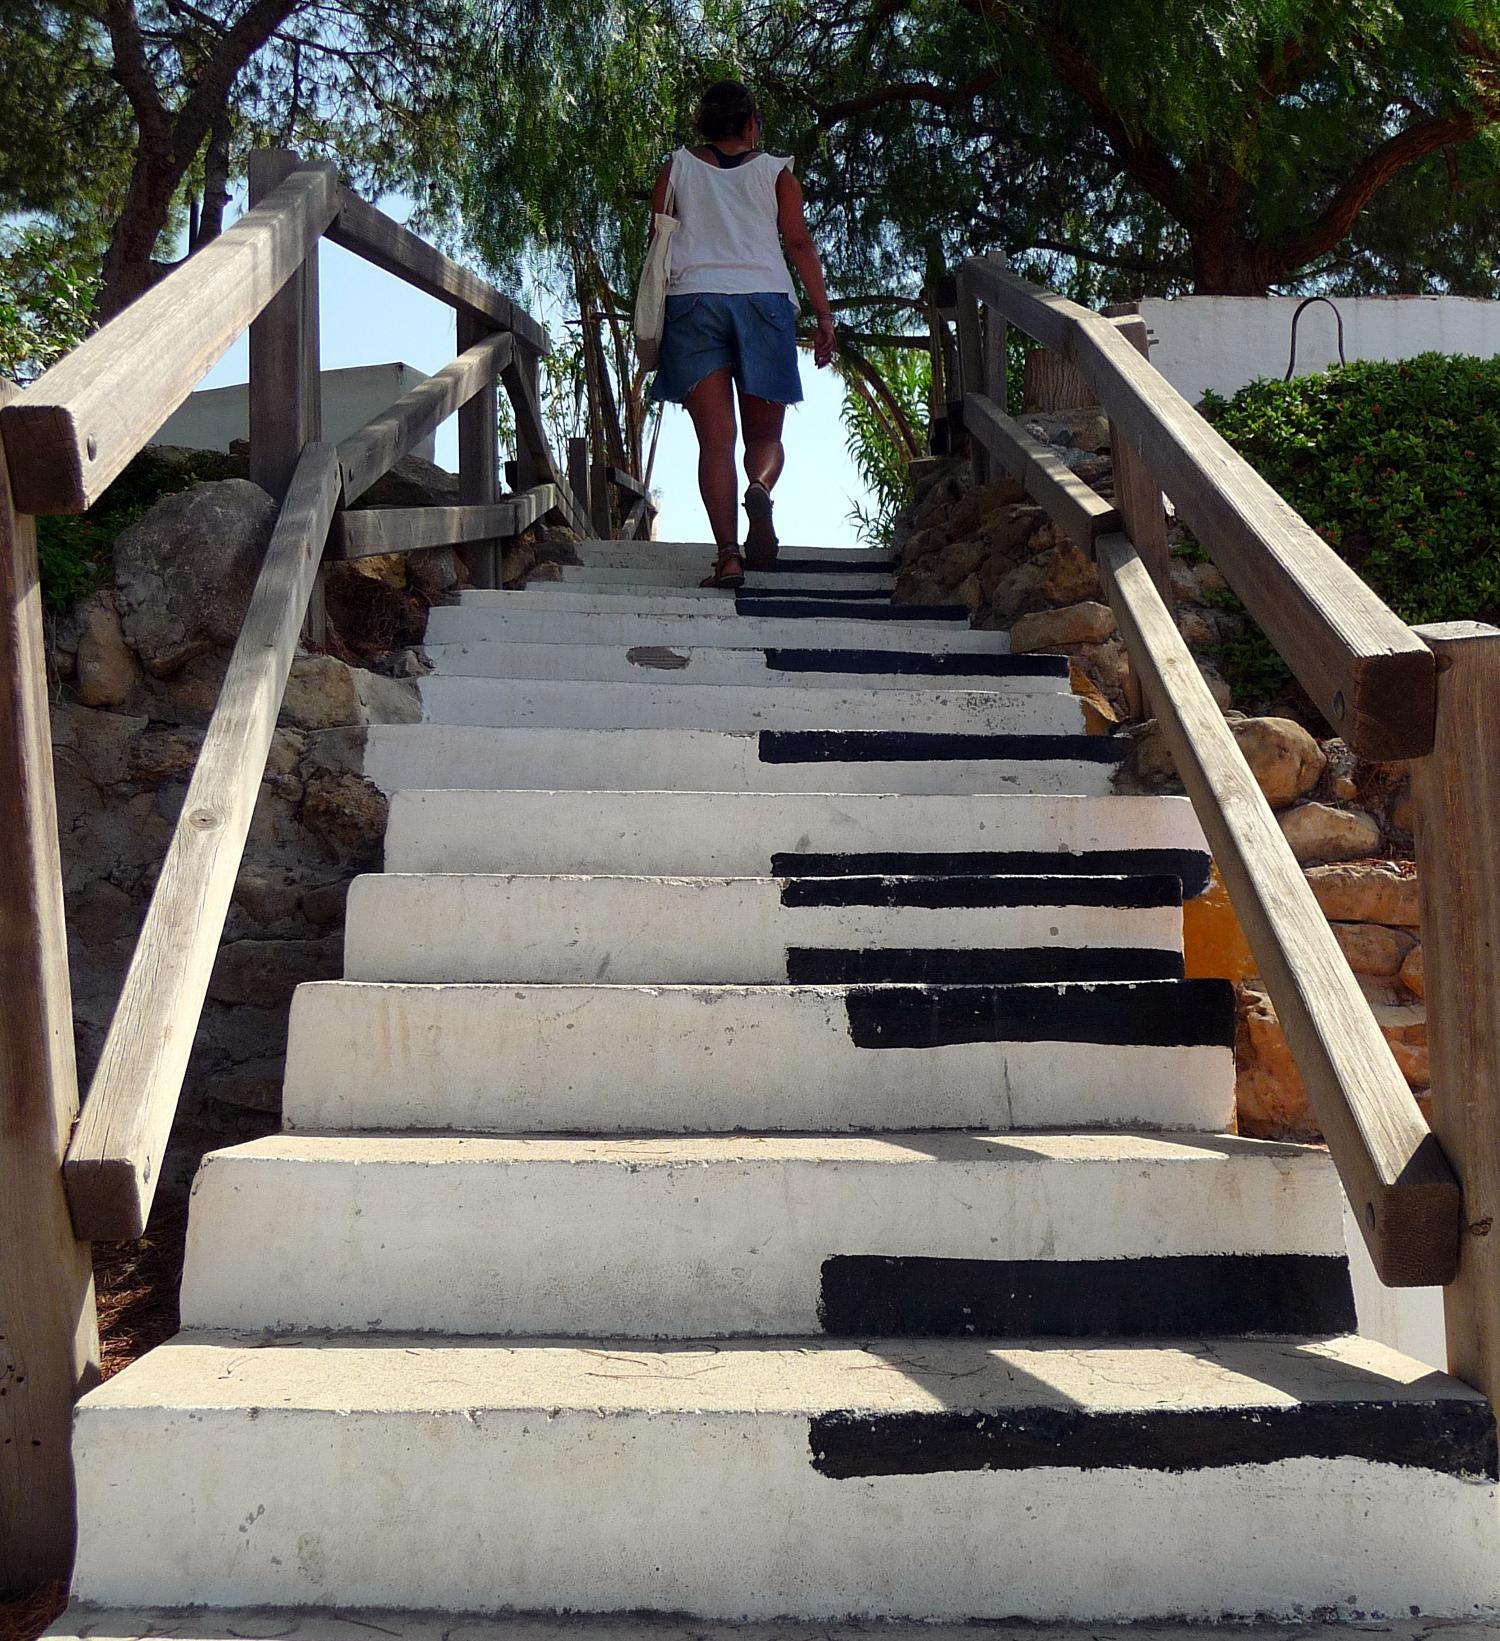 Escaleras creativas pintadas por Carmona. Foto: Verónica López